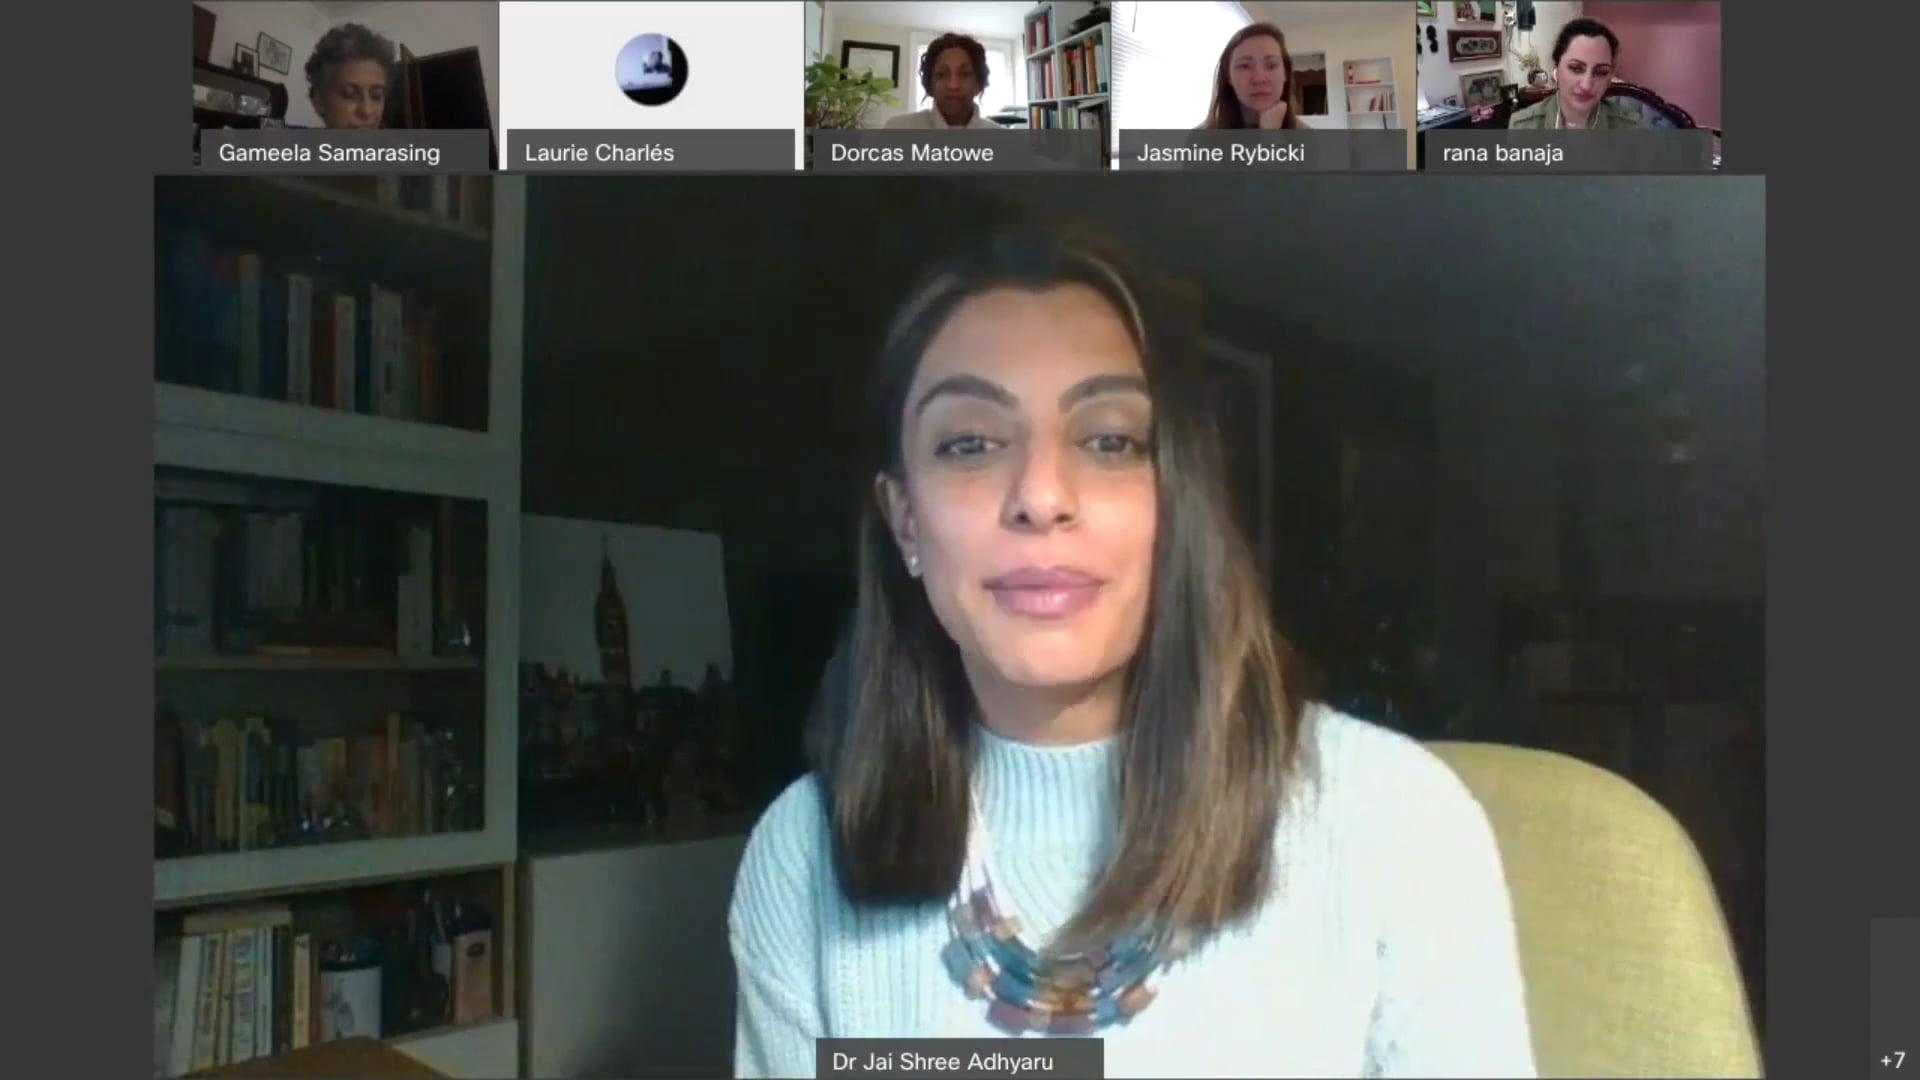 Panel XII of Global Family Systems & Psychosocial Resilience, January 31st 2021 w/ Dr Rana Banaja and Dr Jai Shree Adhyaru